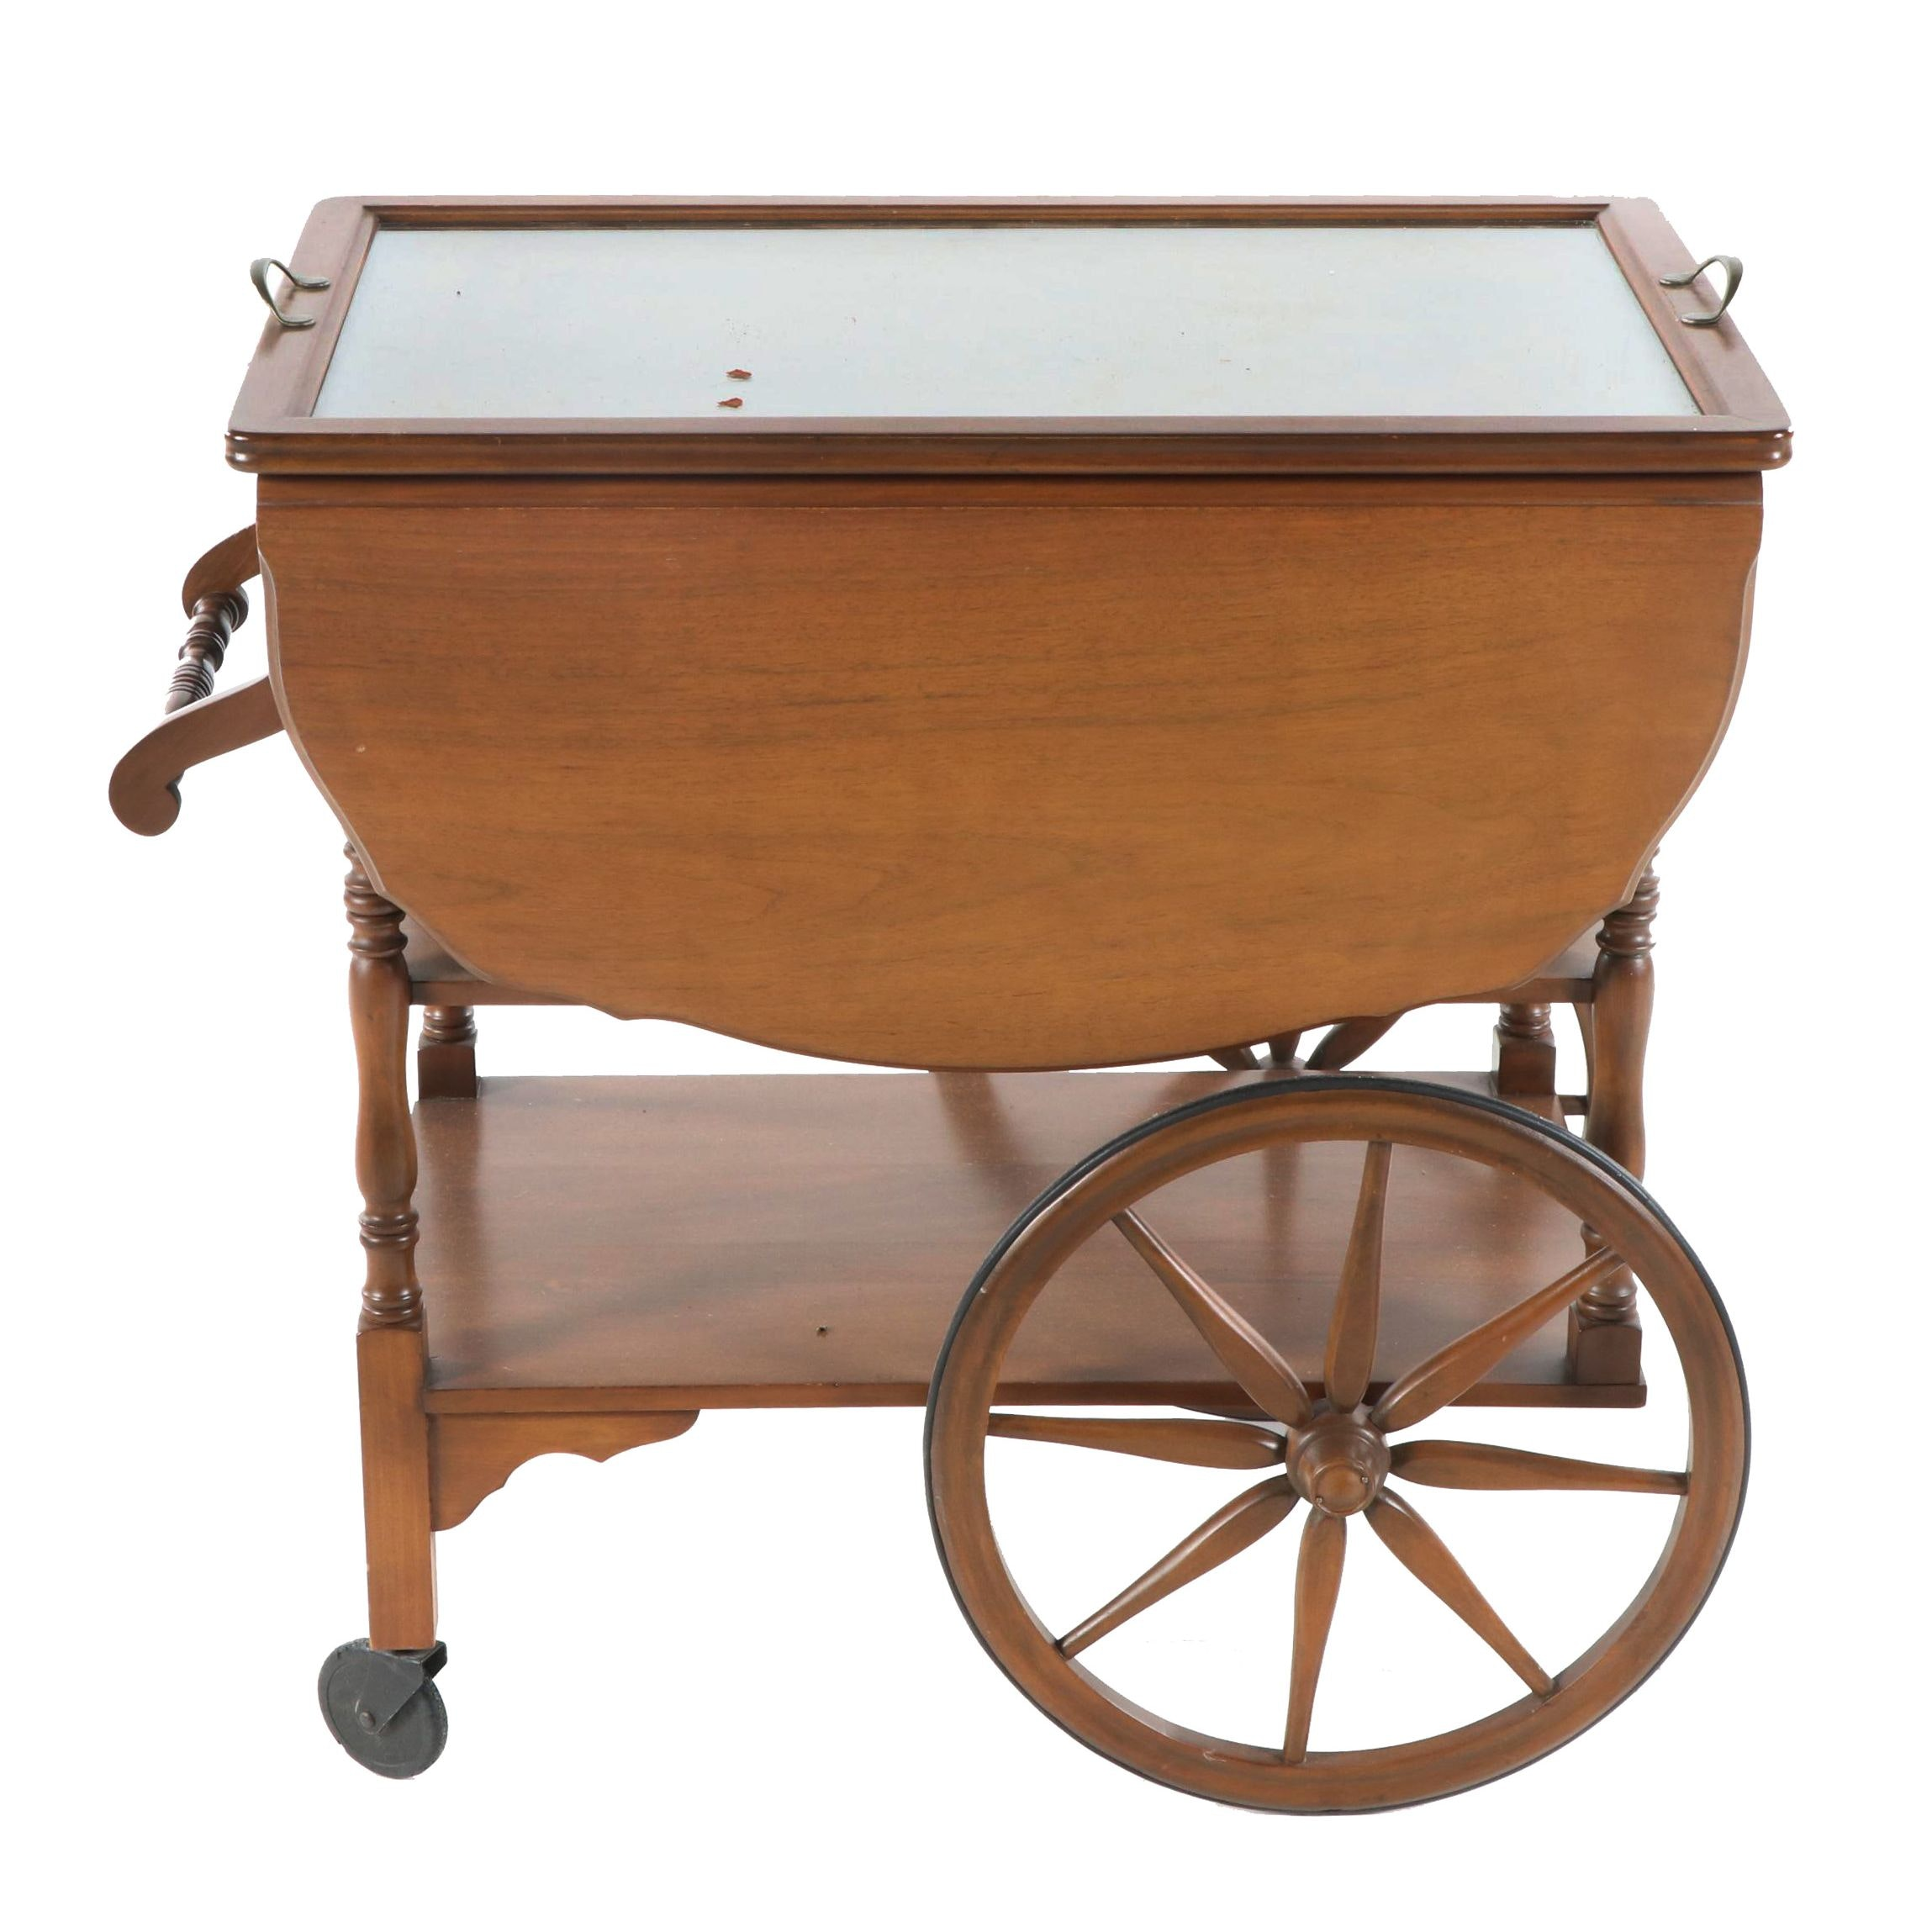 Walnut Drop Leaf Bar Cart with Glass Tray Top, Mid-20th Century